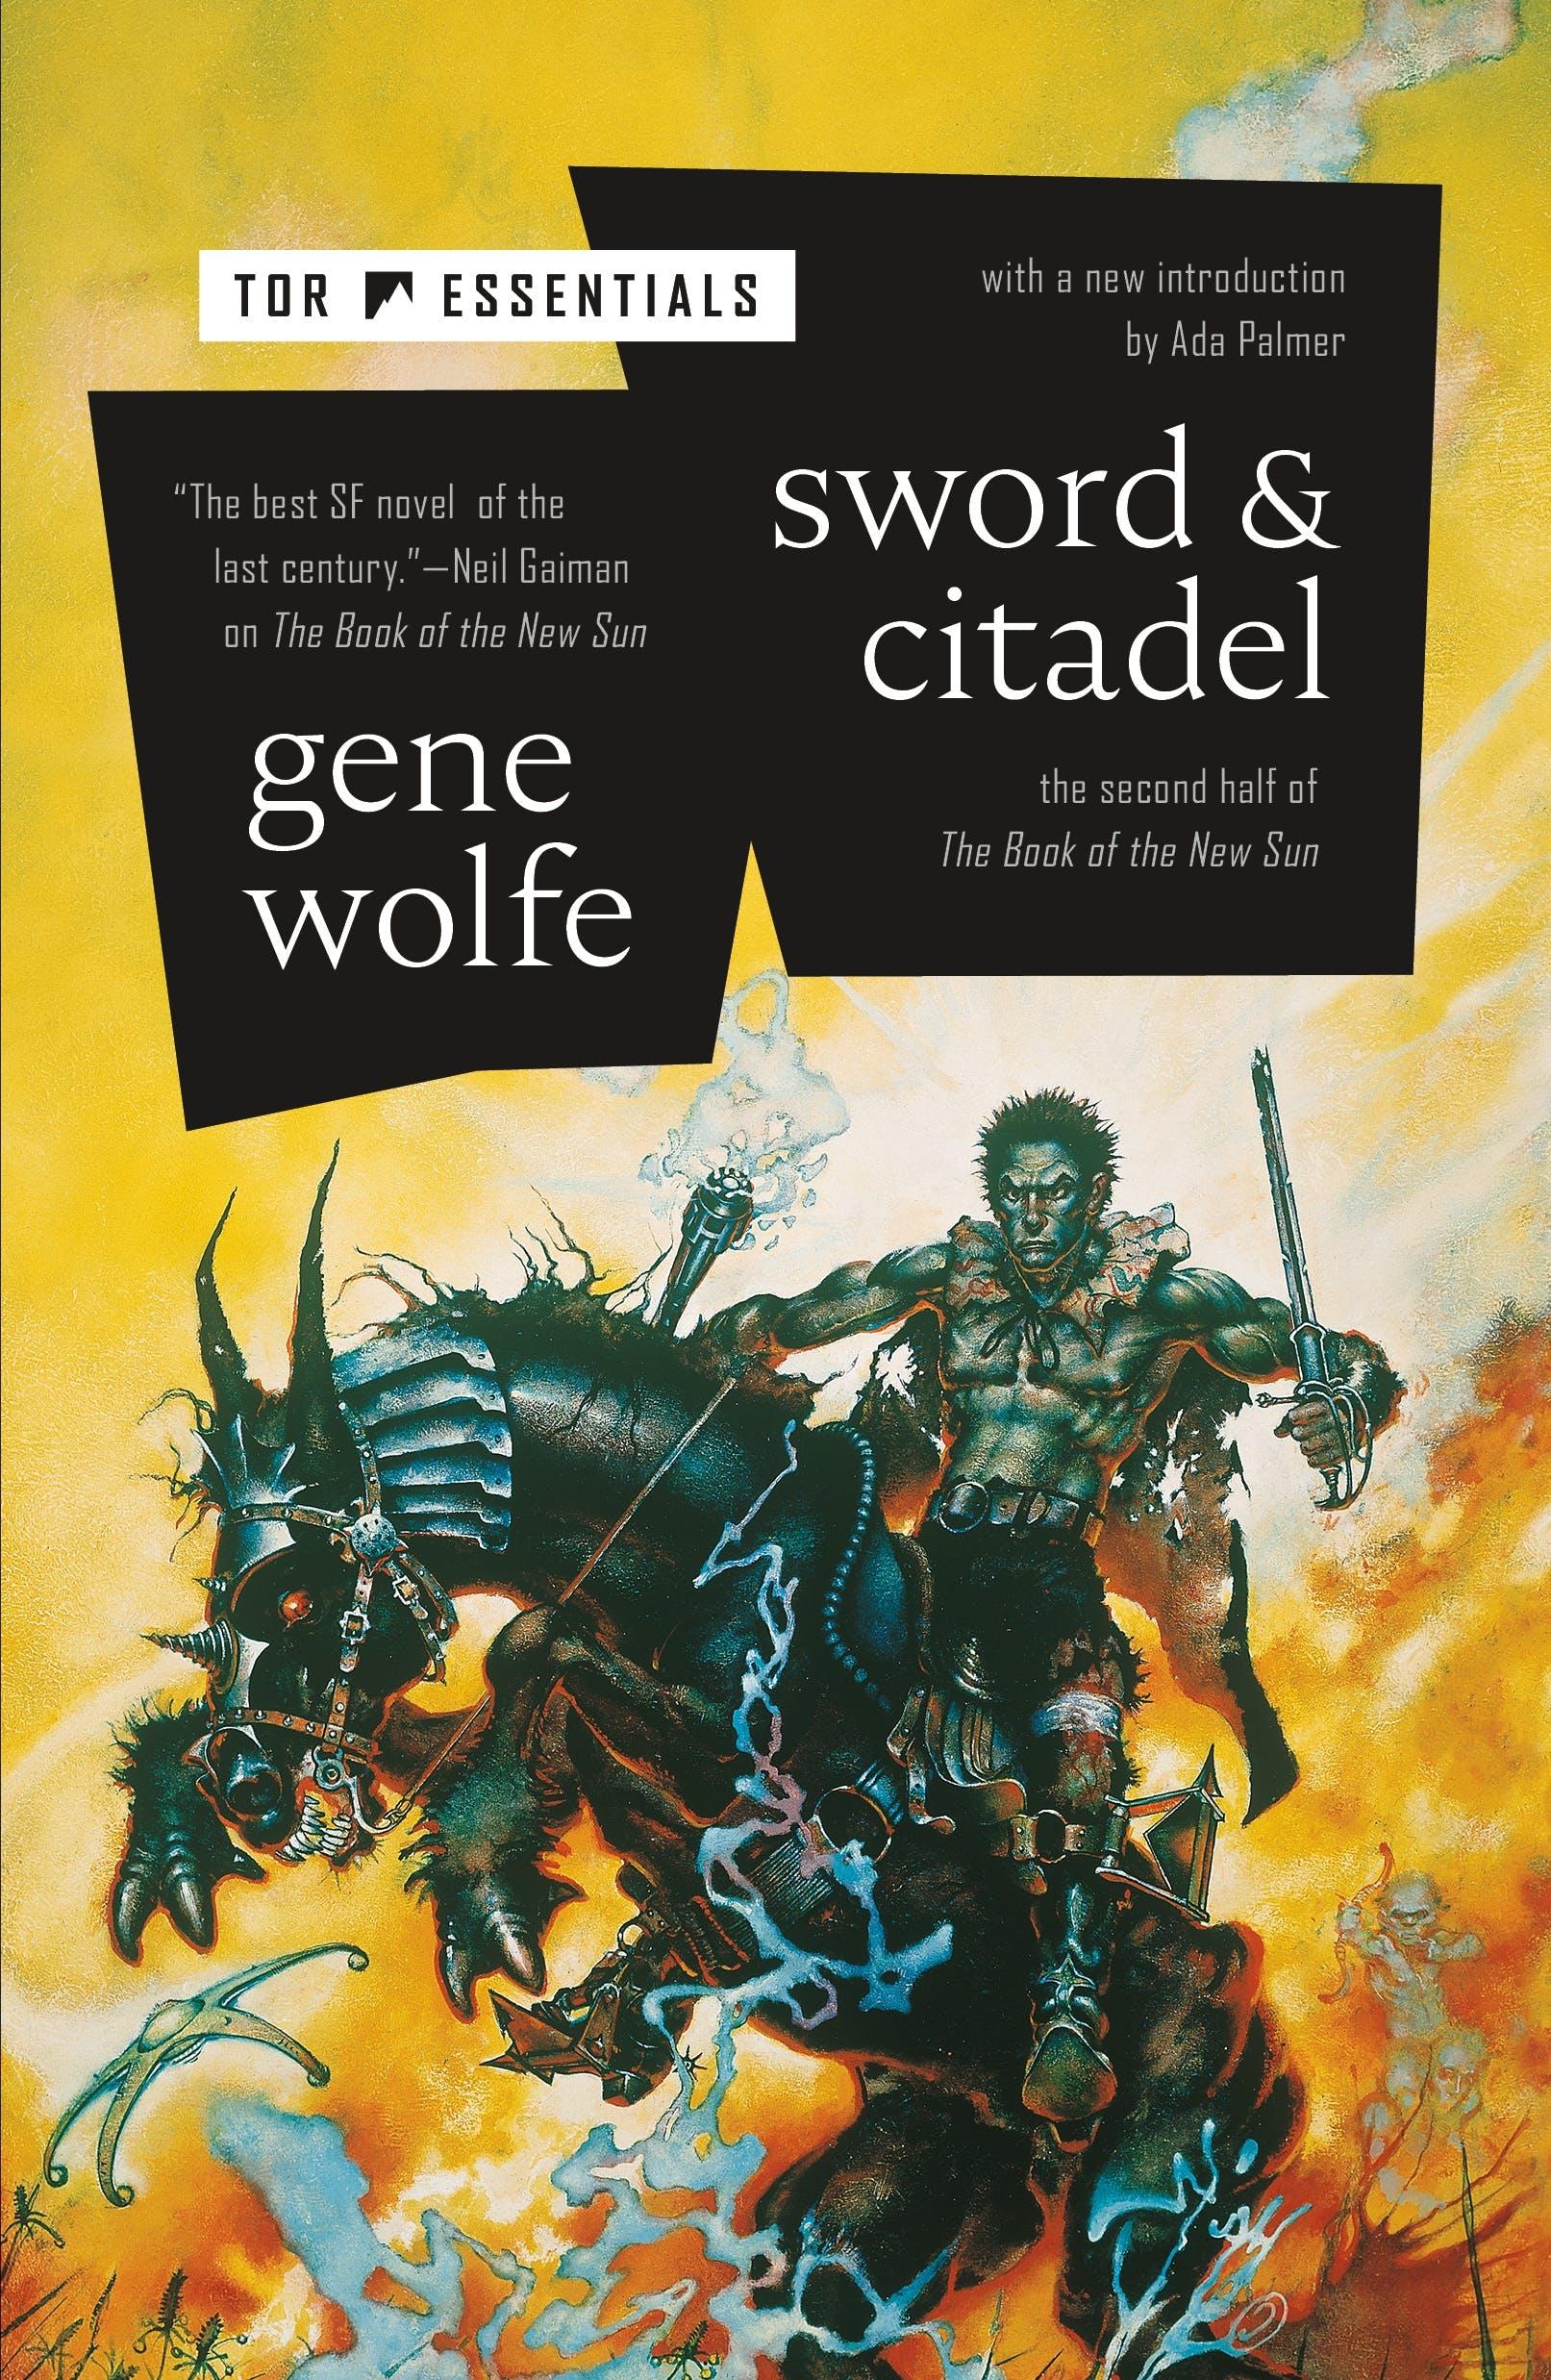 Image of Sword & Citadel